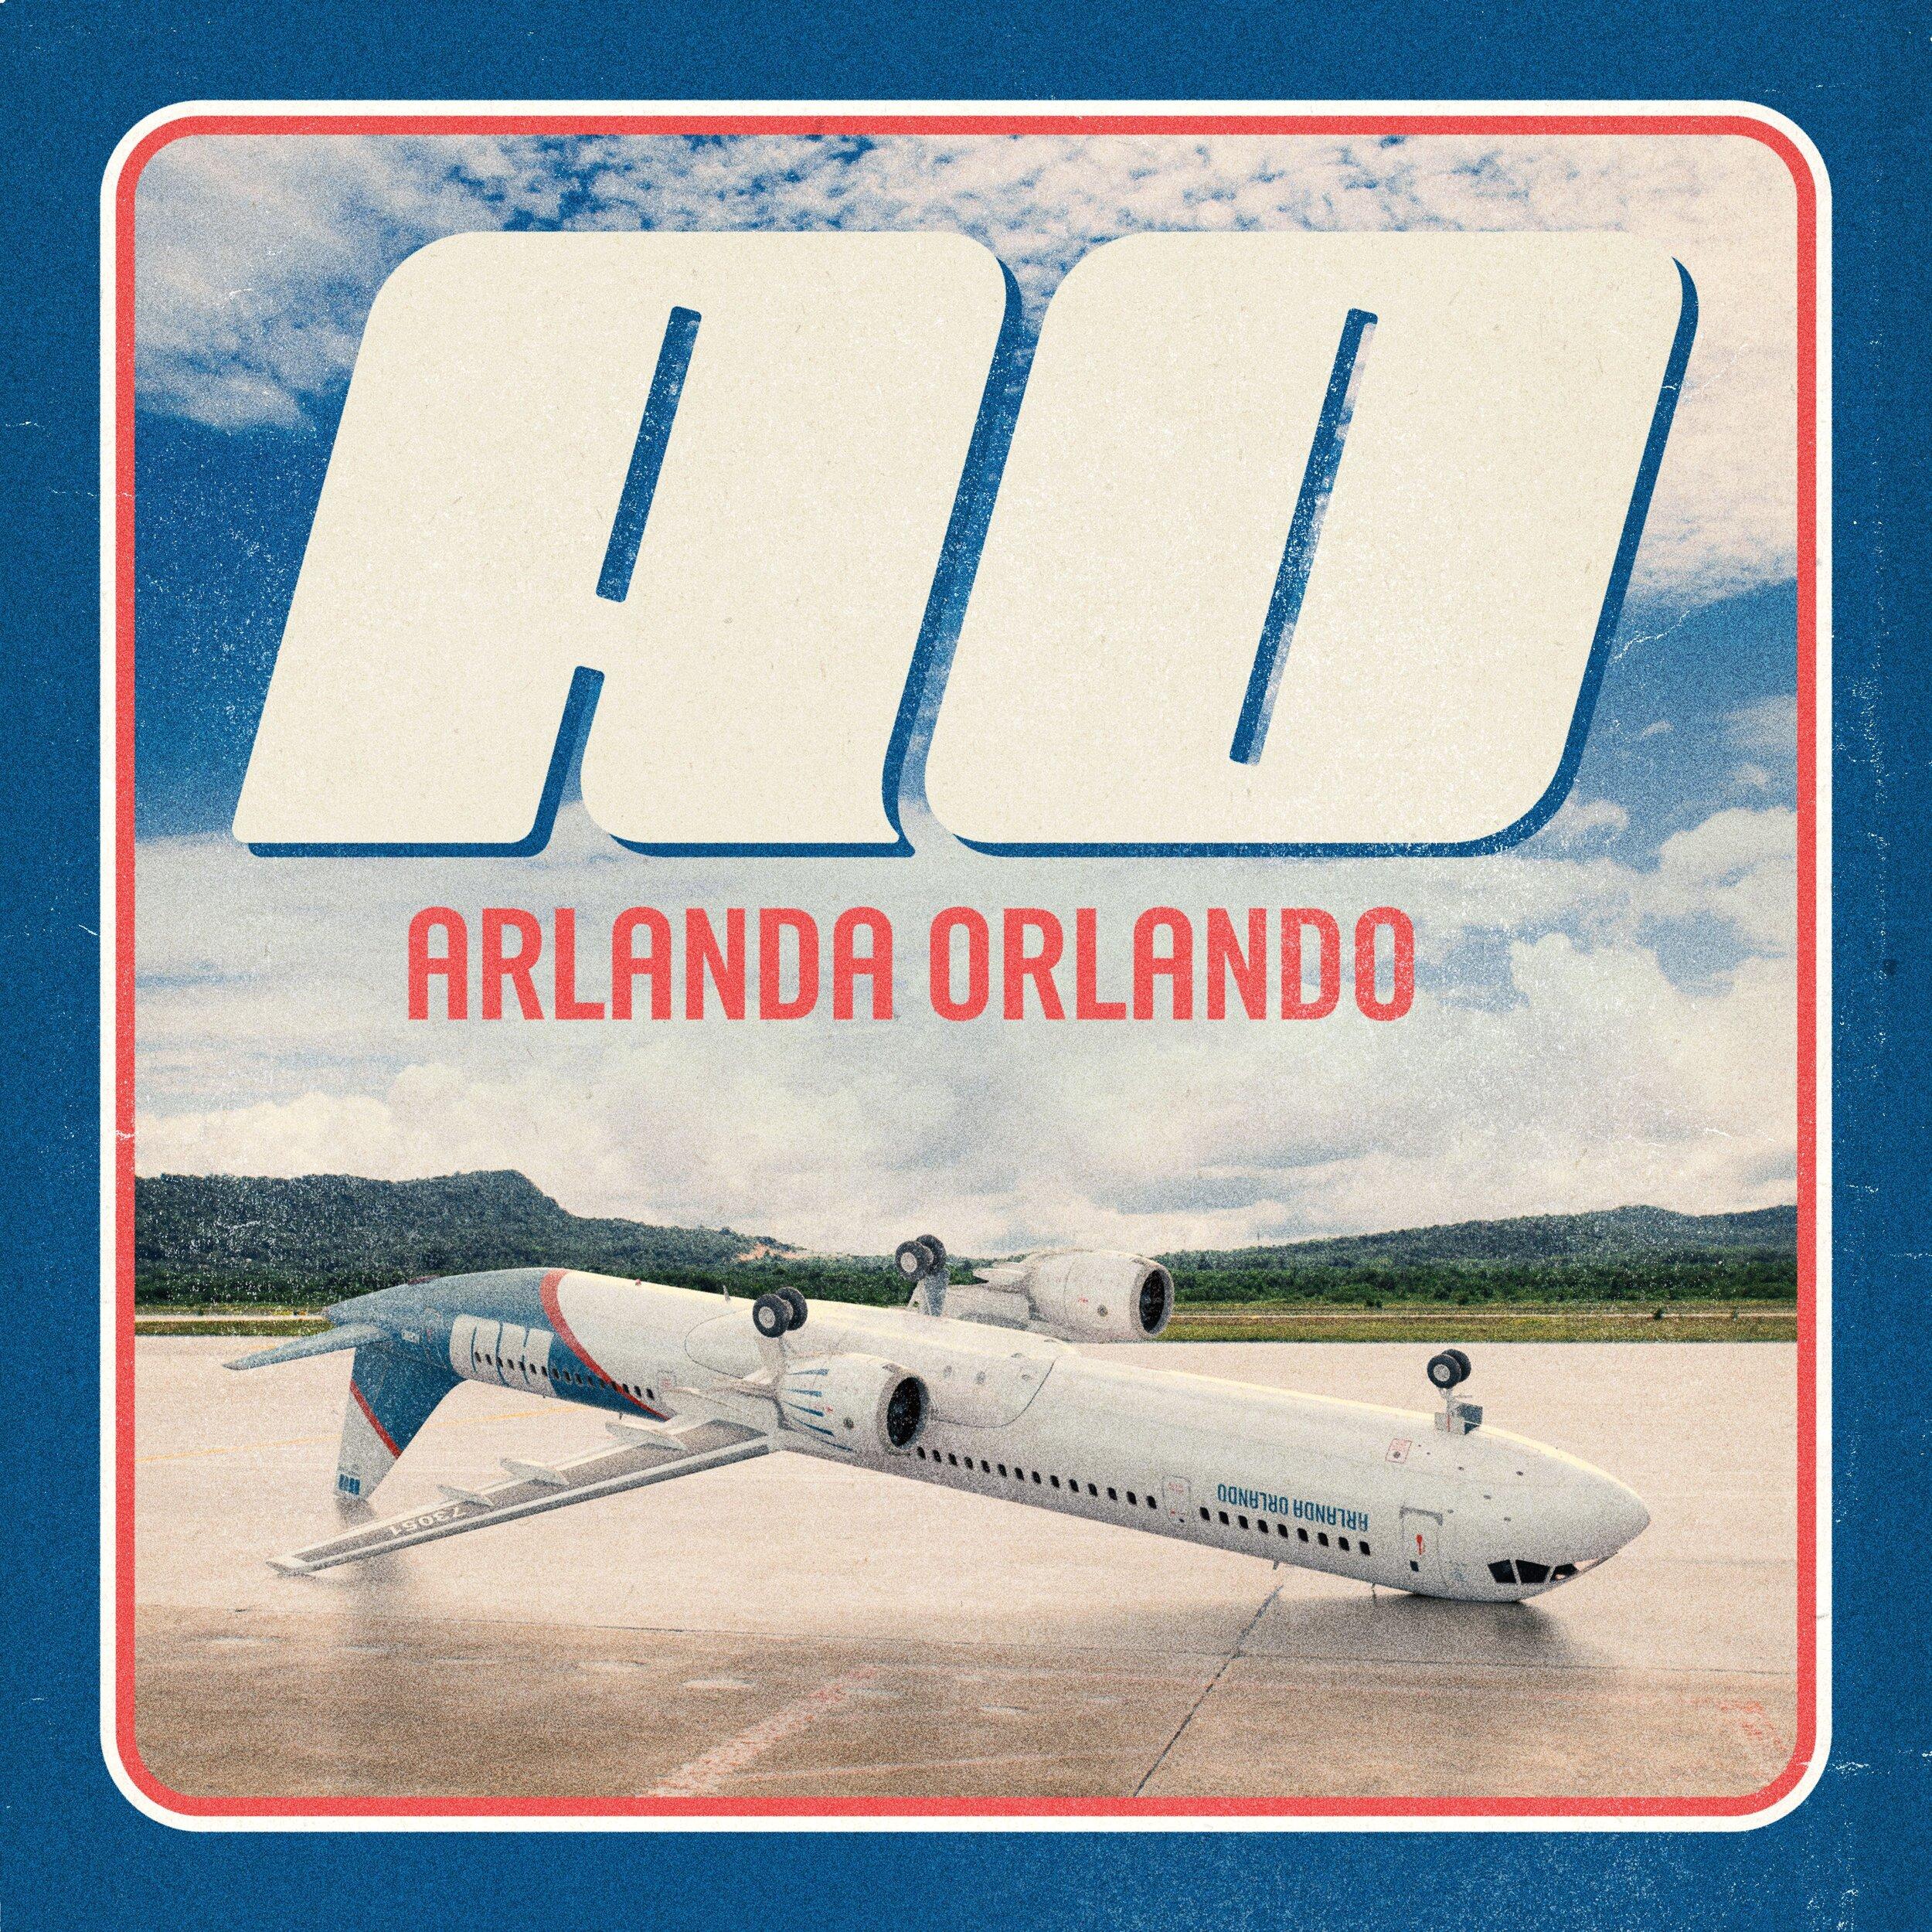 AO_Arlanda-Orlando_001_small.jpg